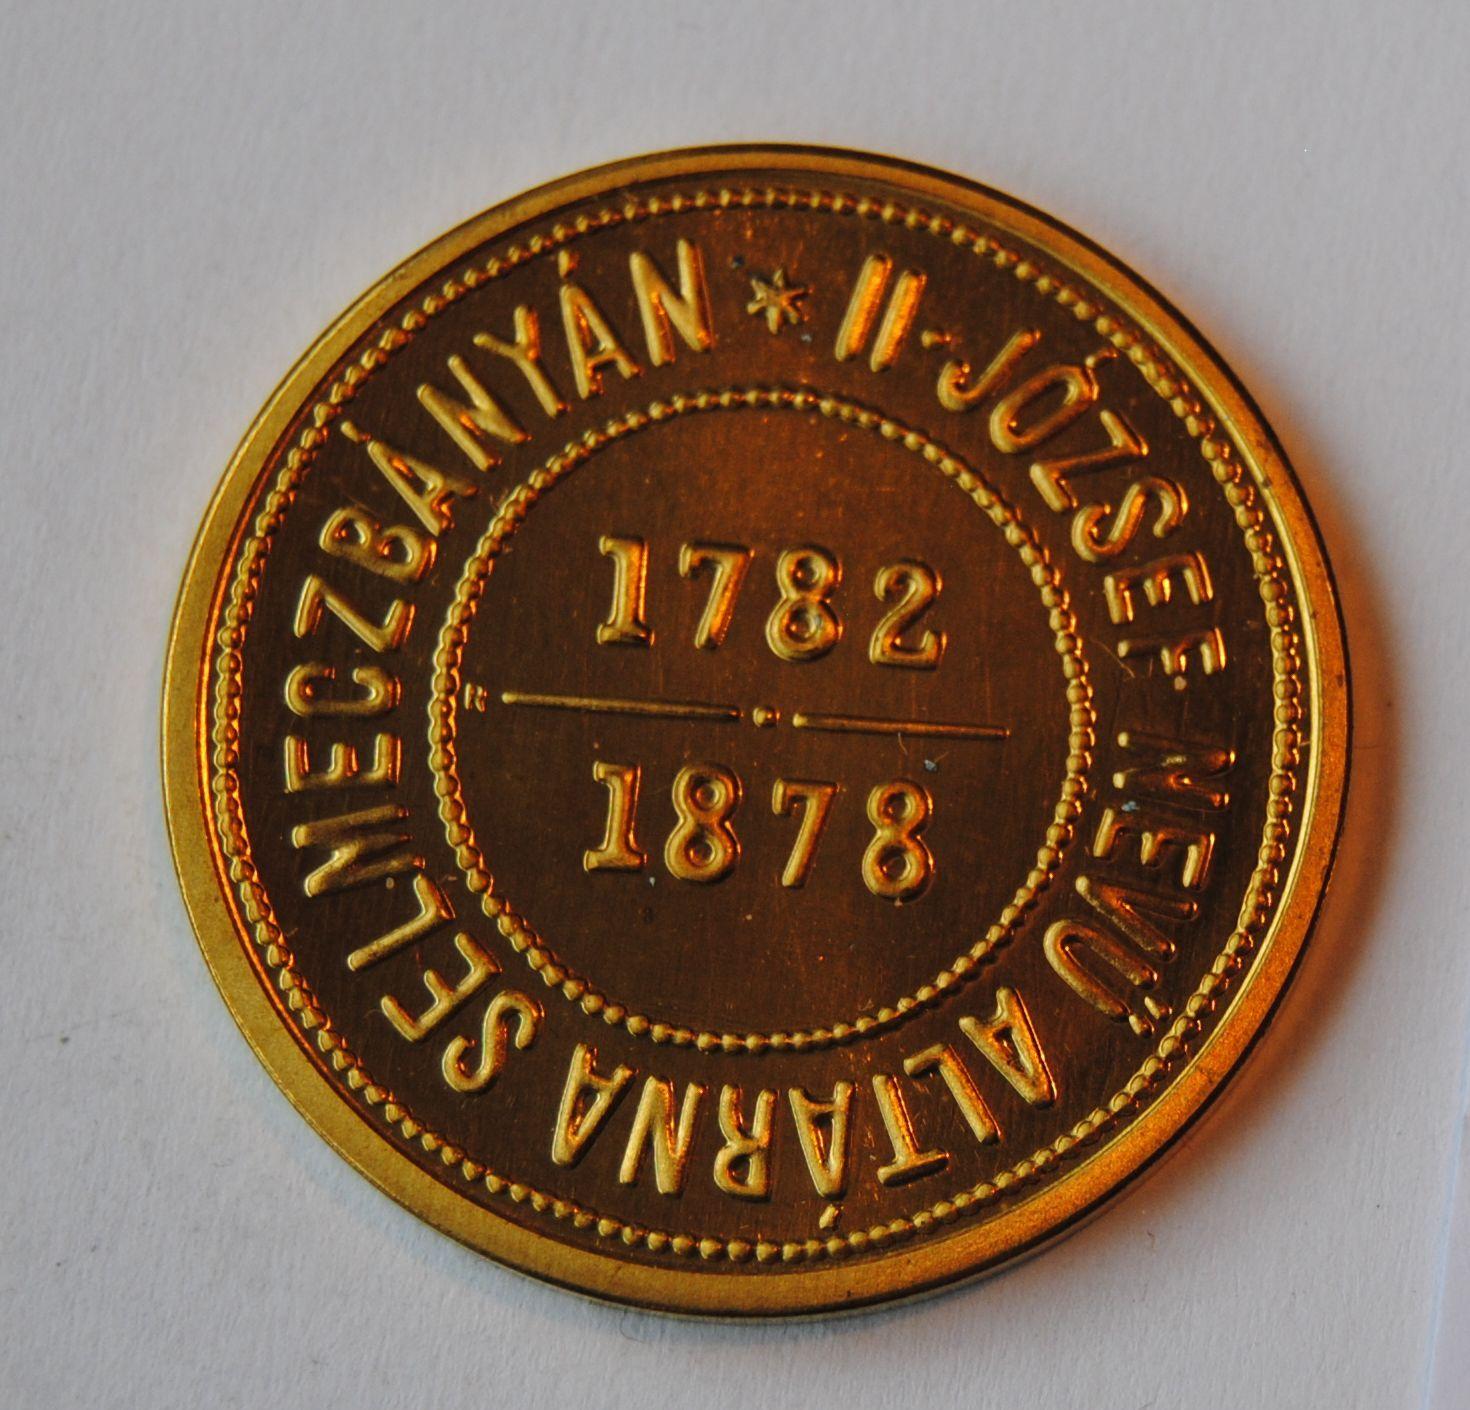 Rakousko 1 Fl zlacený banskoštiav 1878 - novoražba